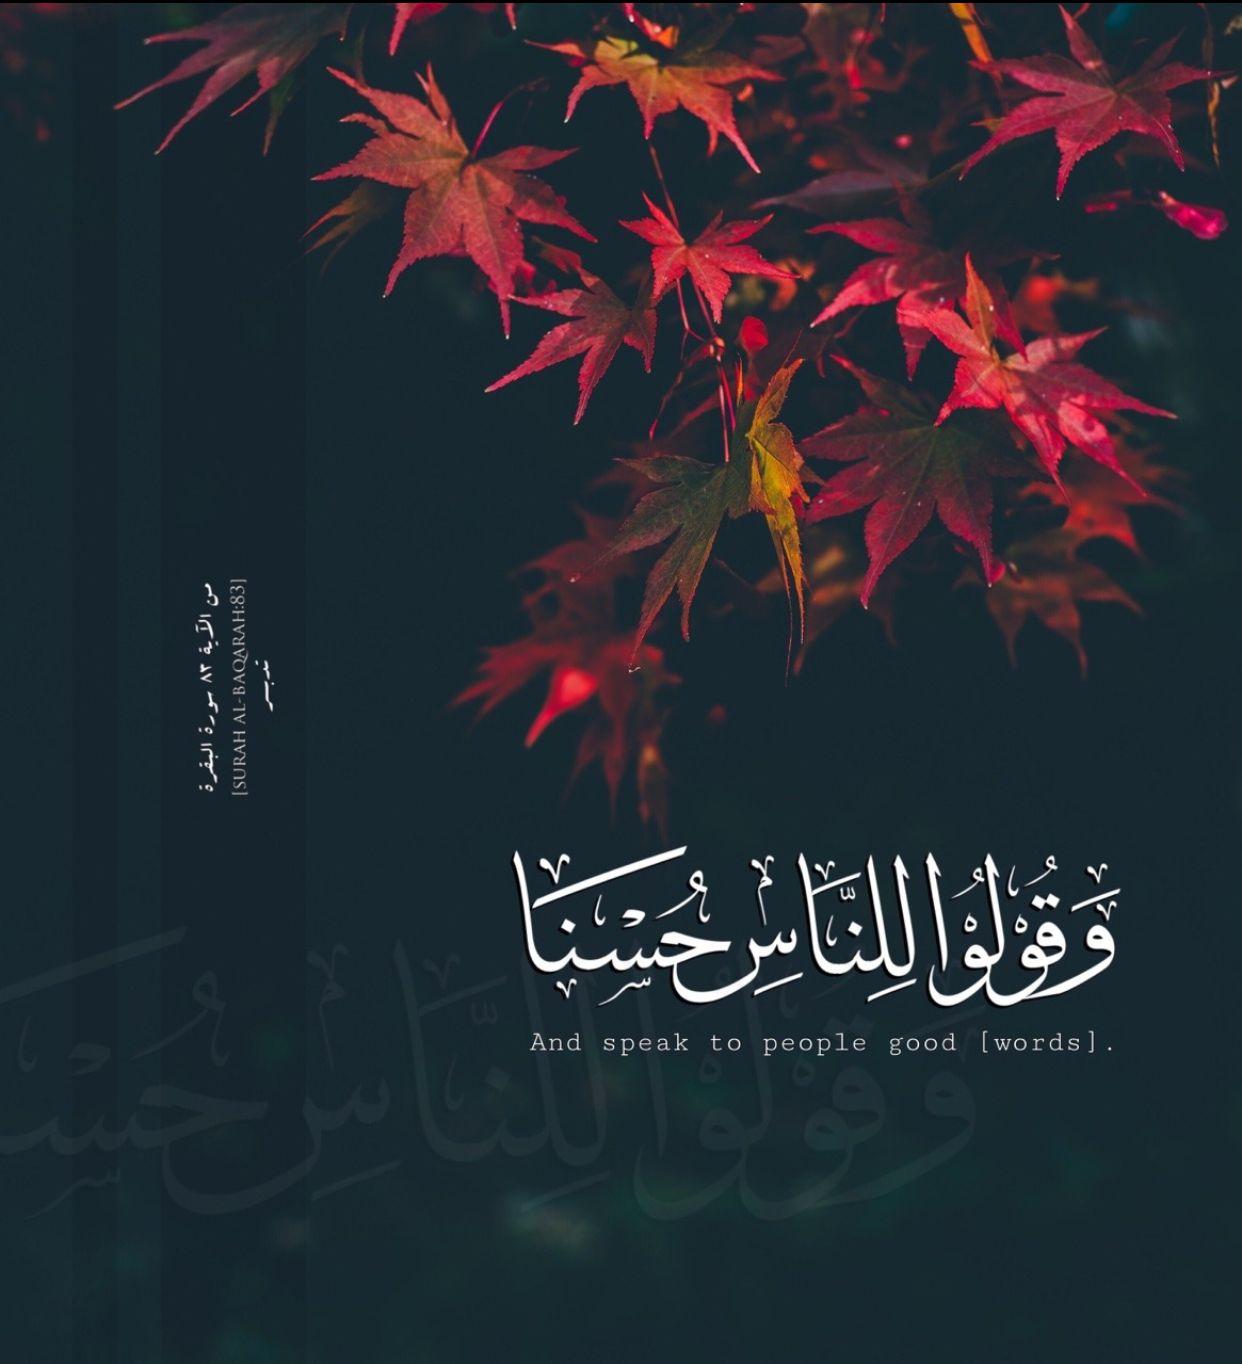 Pin By Rozita Mahmood On Quran Verses Islamic Quotes Quran Quotes Verses Quran Quotes Love Quran Quotes Inspirational